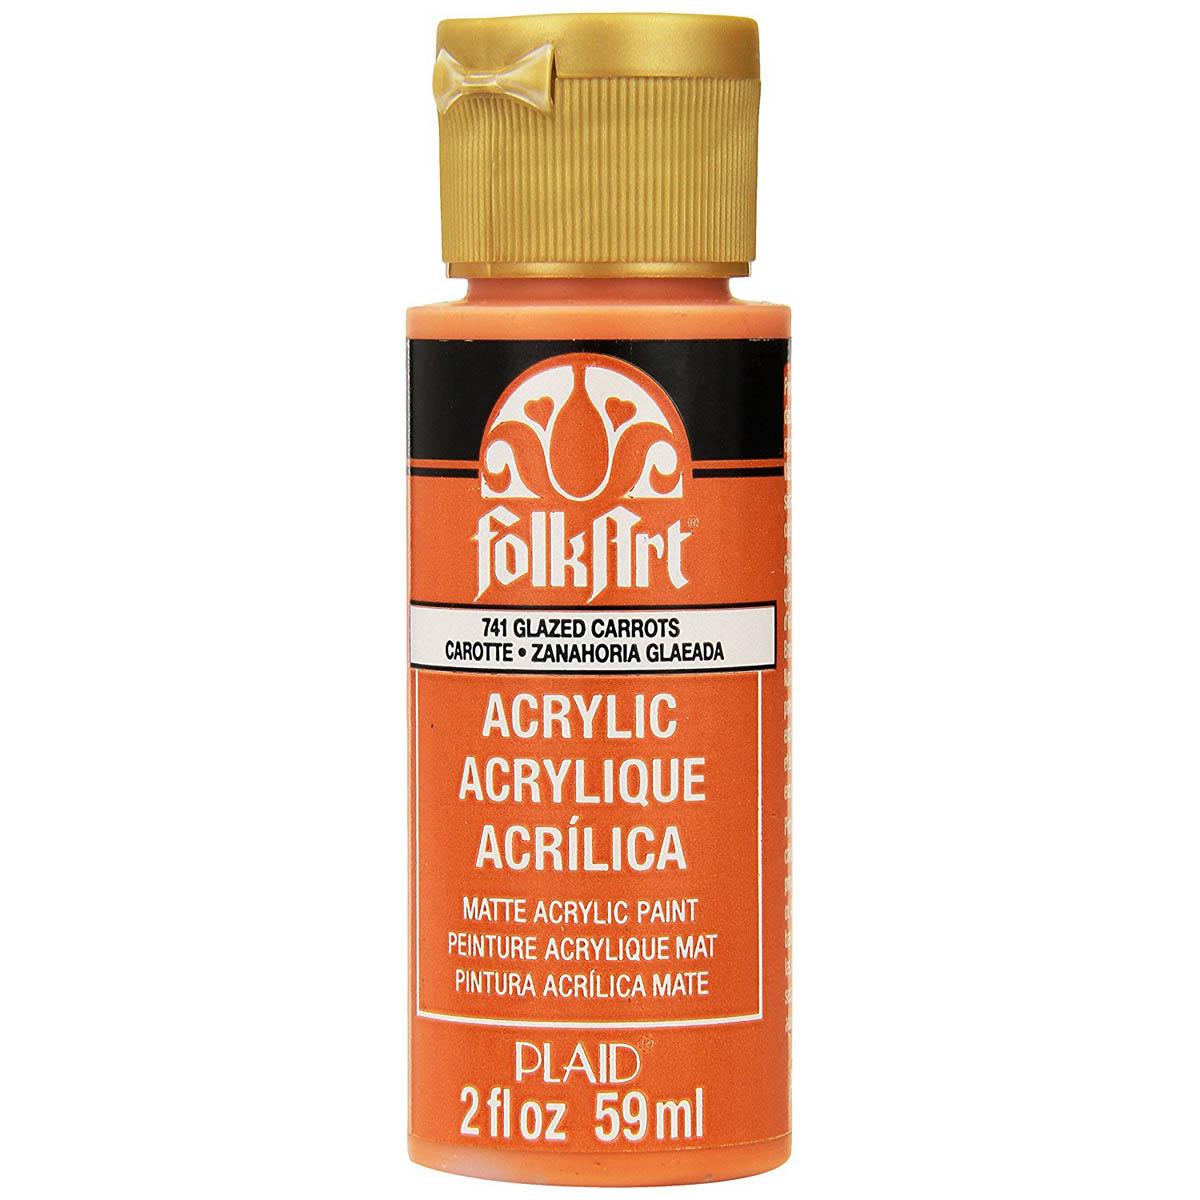 FolkArt ® Acrylic Colors - Glazed Carrots, 2 oz. - 741